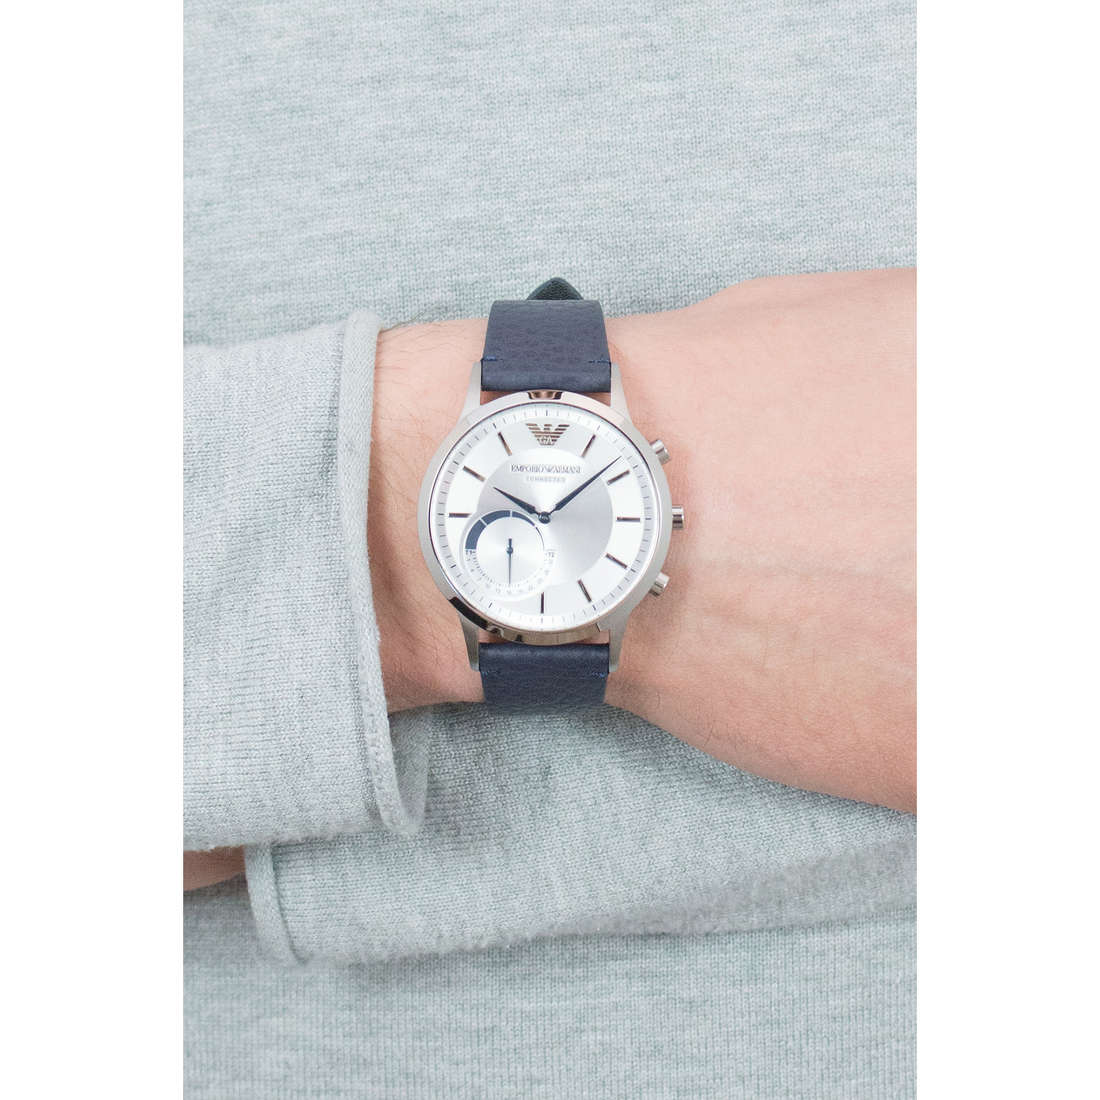 Emporio Armani Smartwatches uomo ART3003 indosso